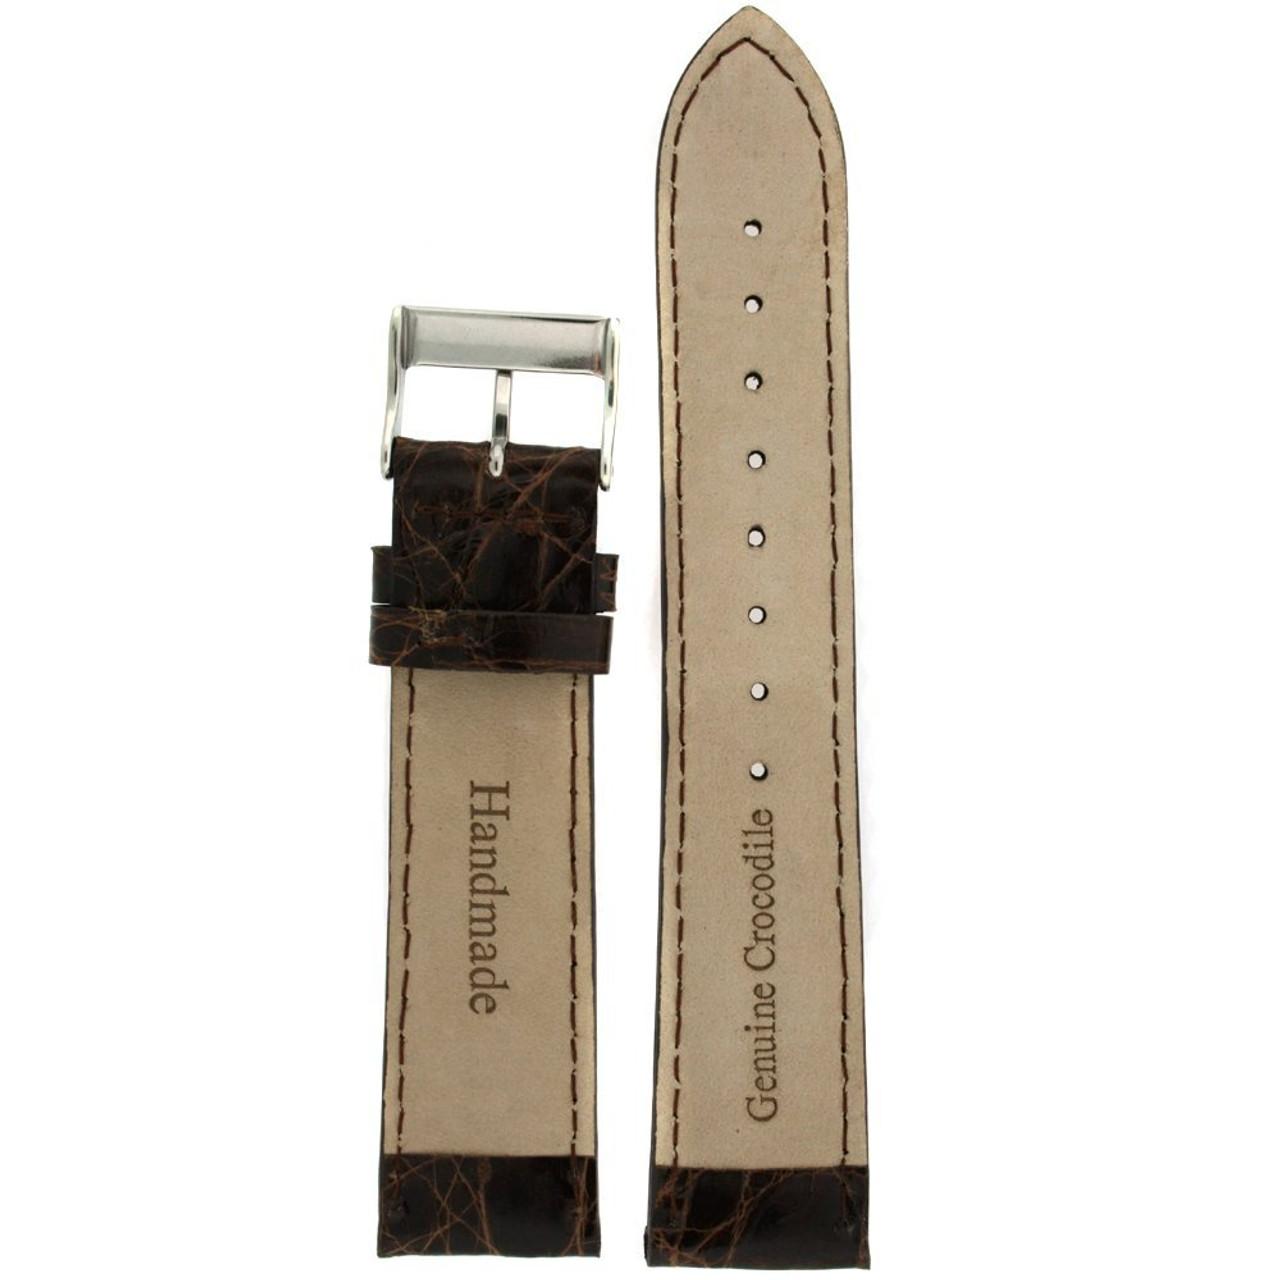 Genuine Crocodiledile Watch Band Dark Brown Stitching Padded - Main